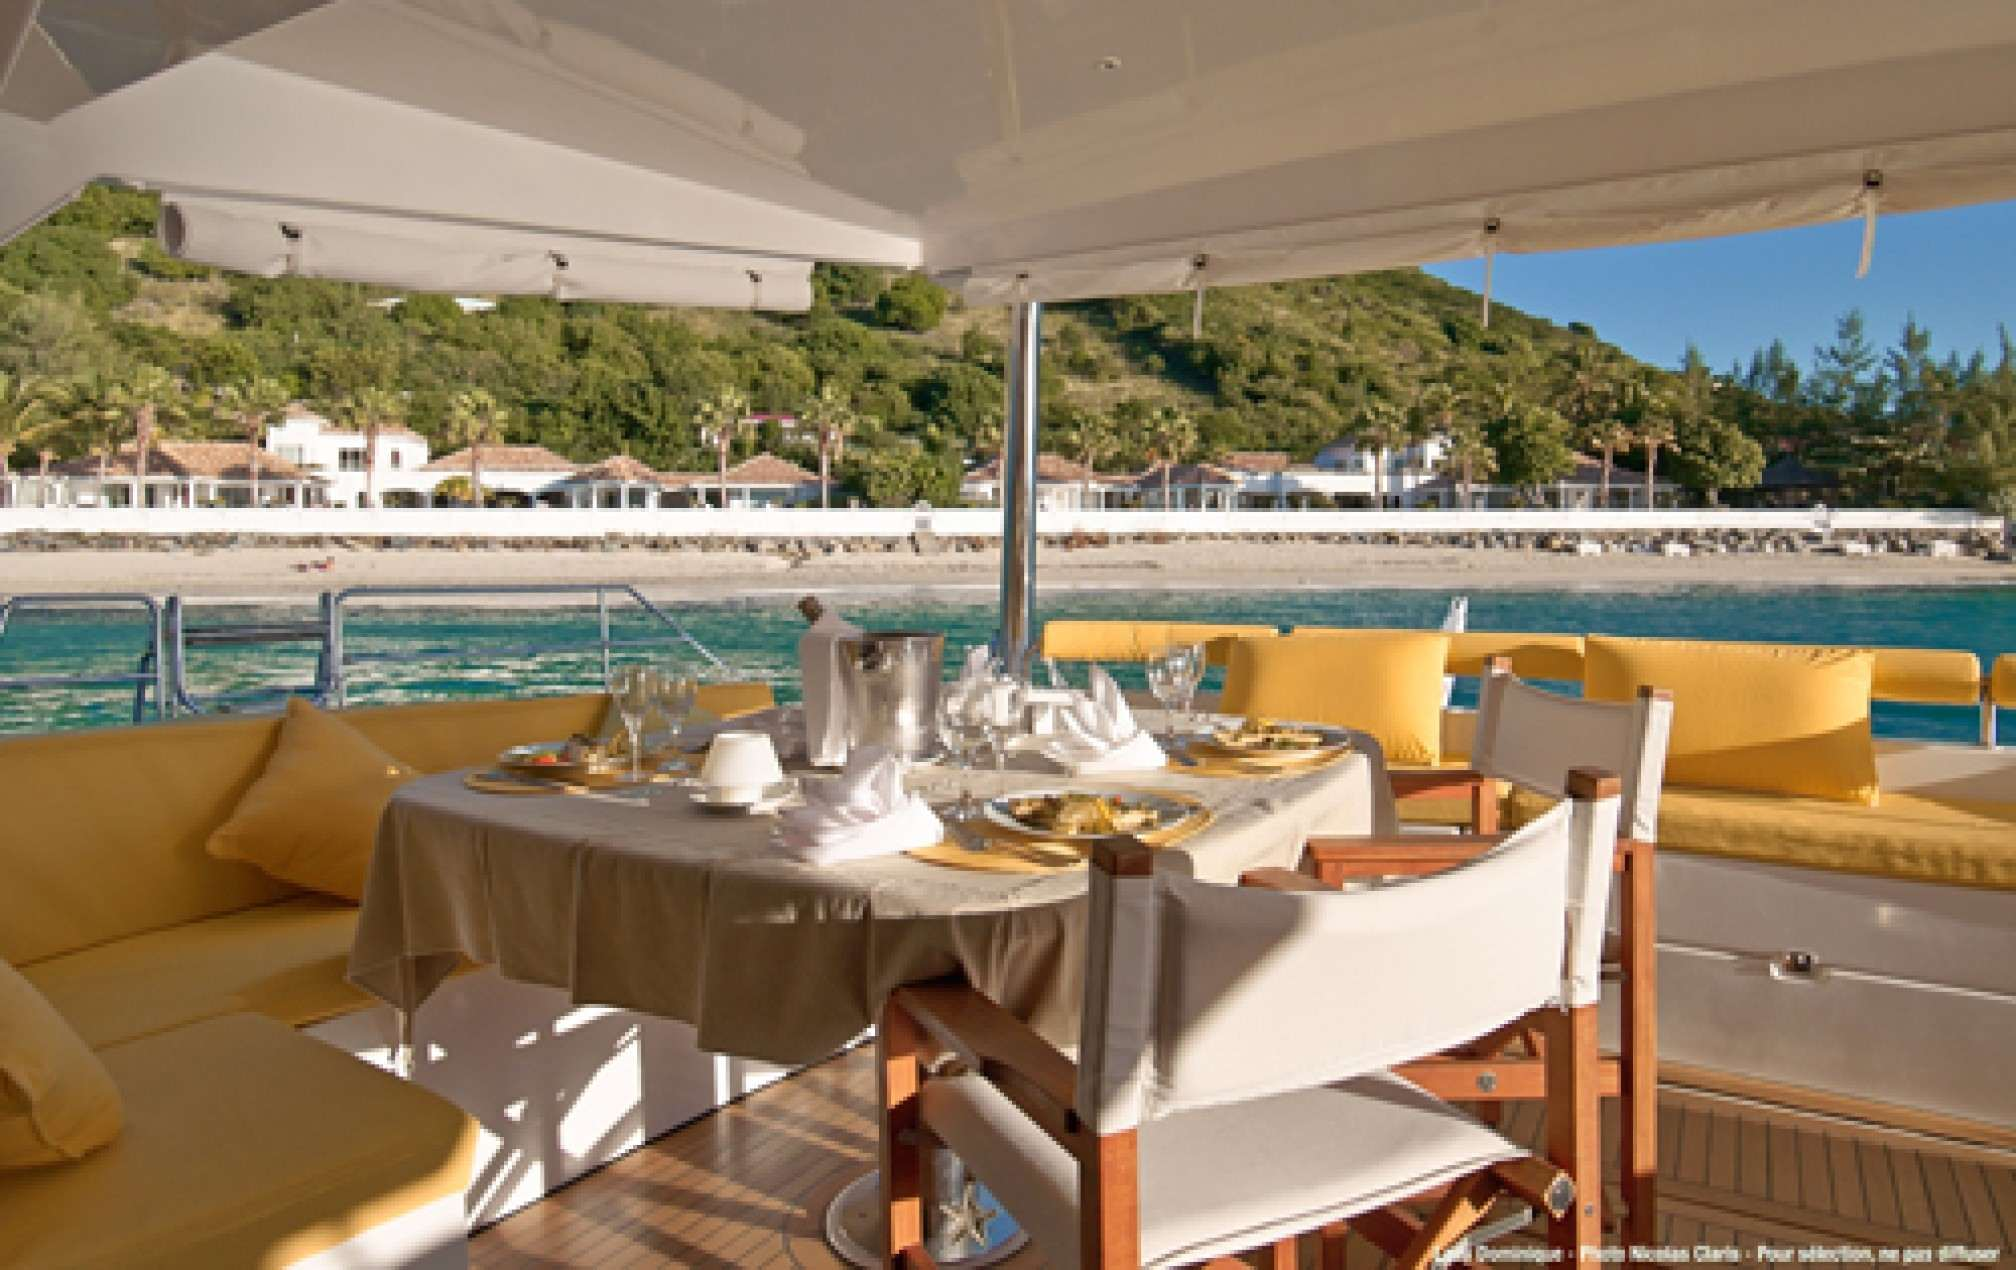 Lady Dominique II luxury catamaran charter deck table